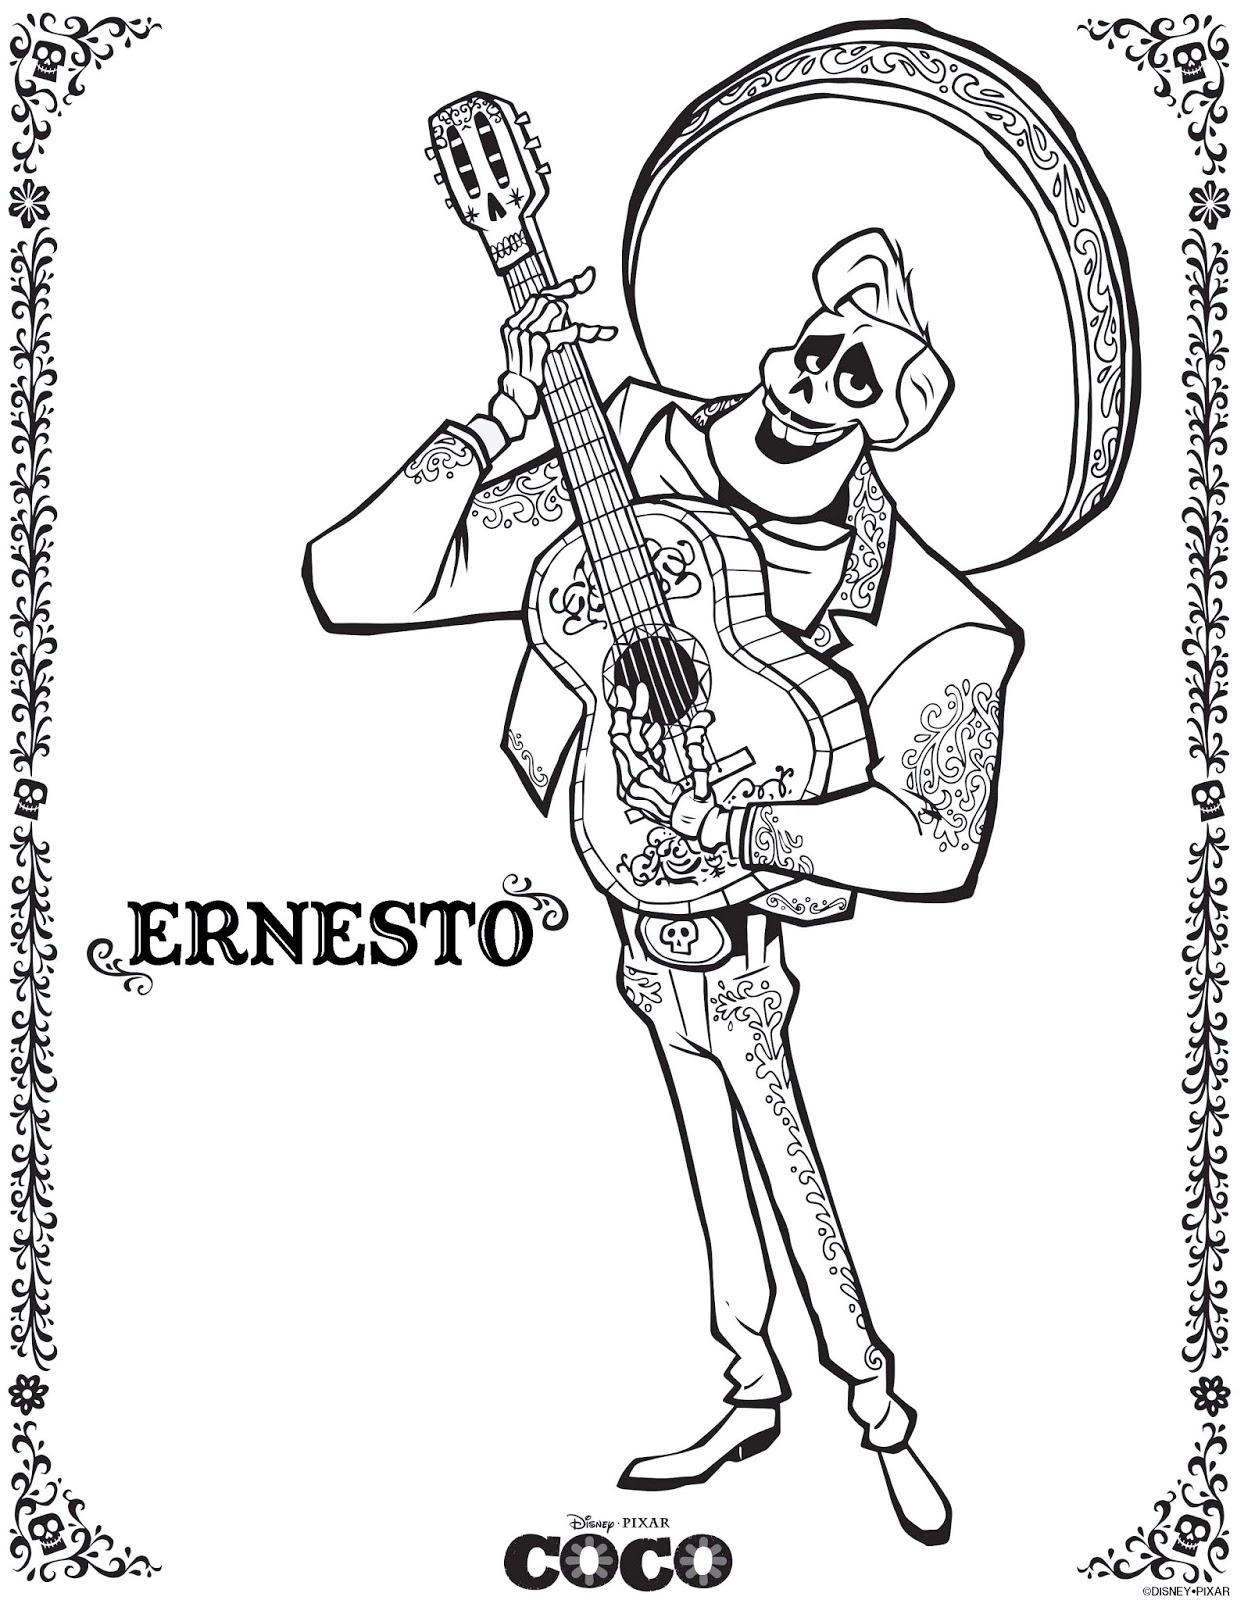 ernesto coco coloring pages from disney pixar movie - Coloring Page Coco